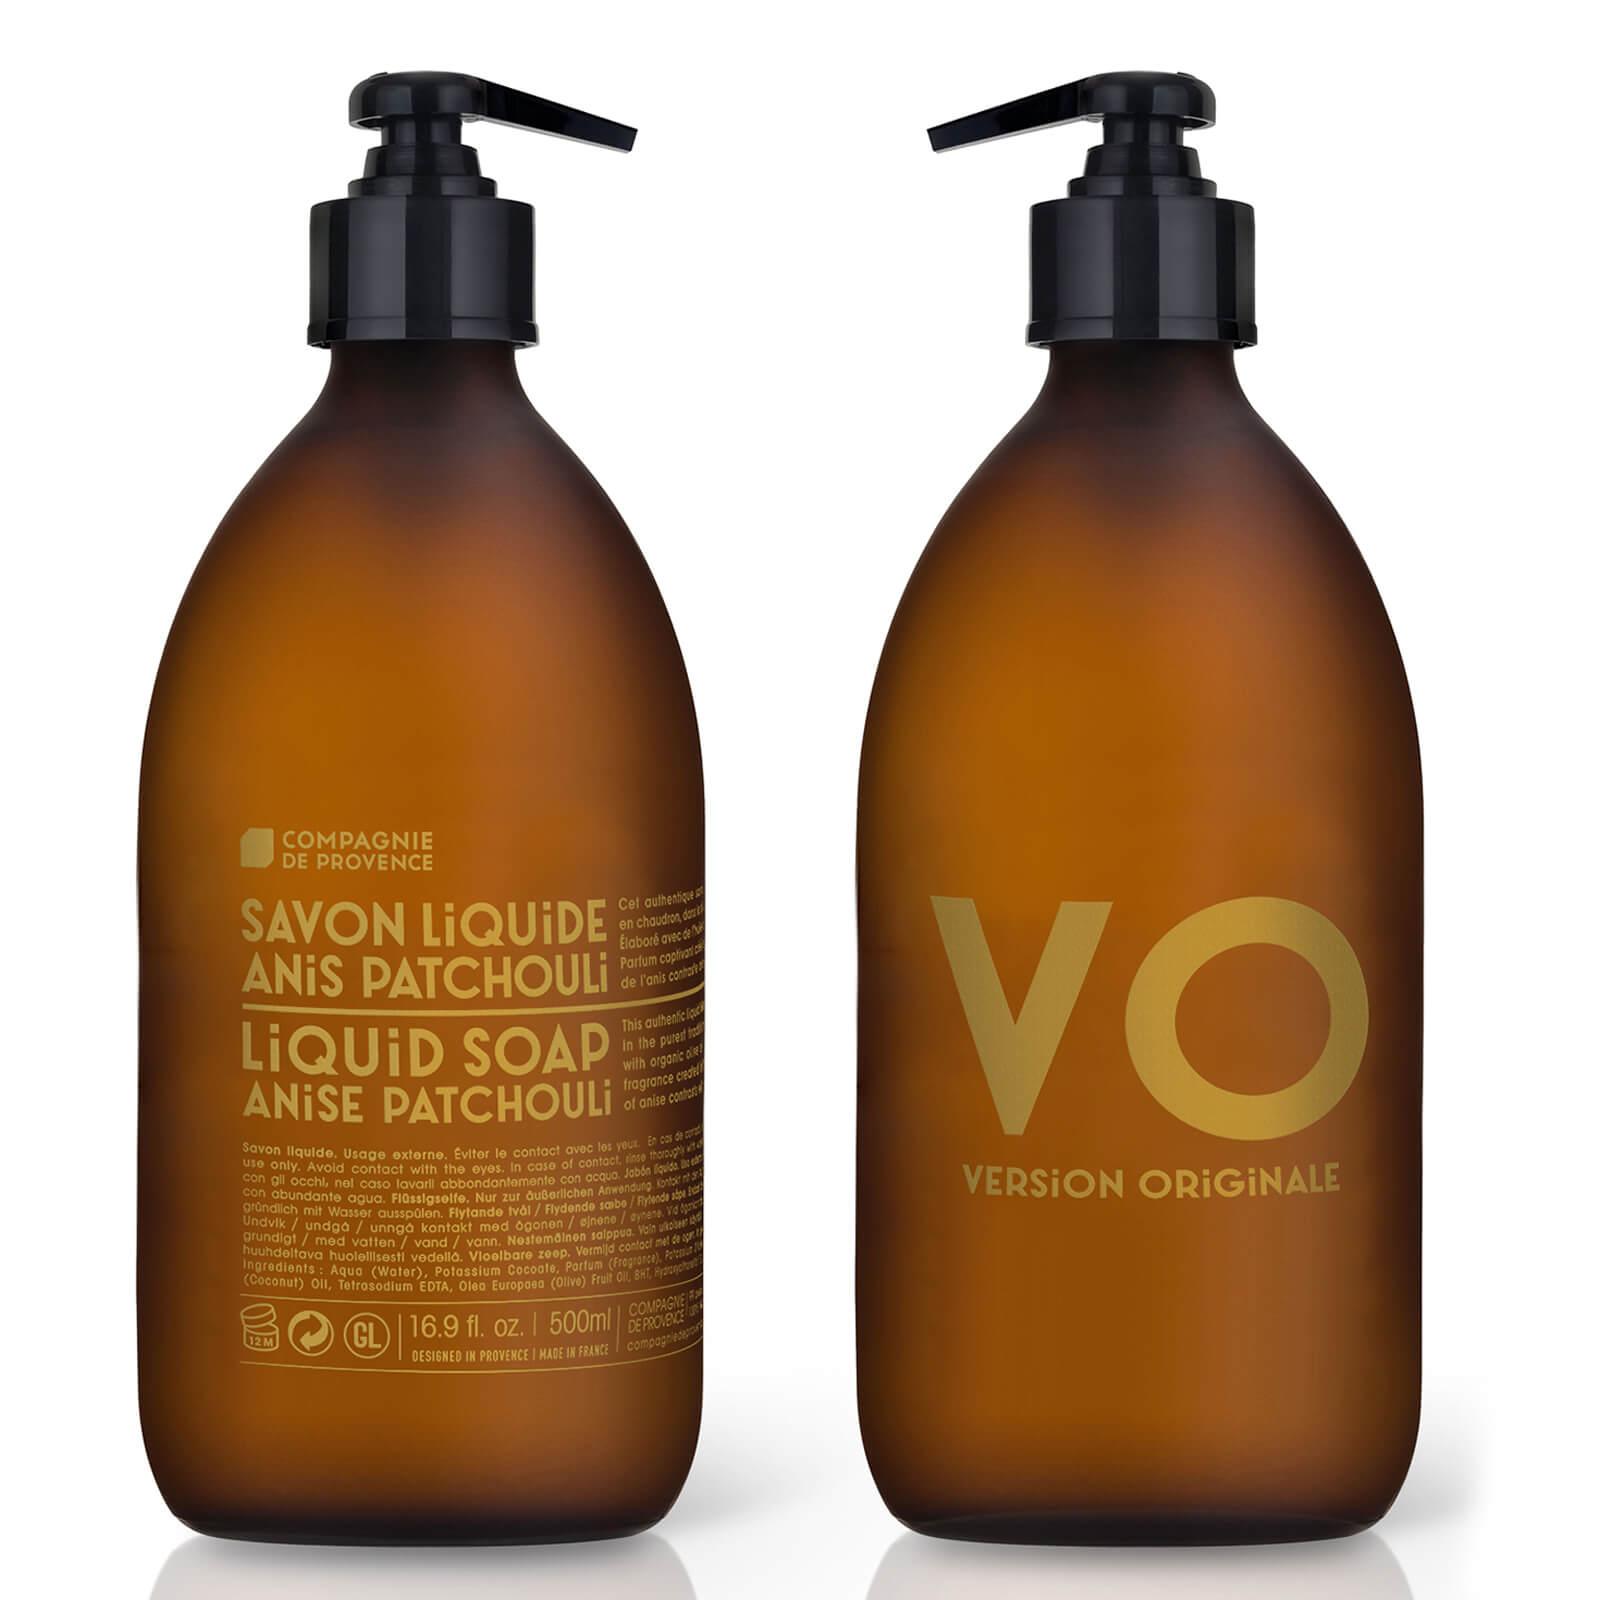 Купить Жидкое мыло Compagnie de Provence Liquid Marseille Soap 500 мл - Anise Patchouli